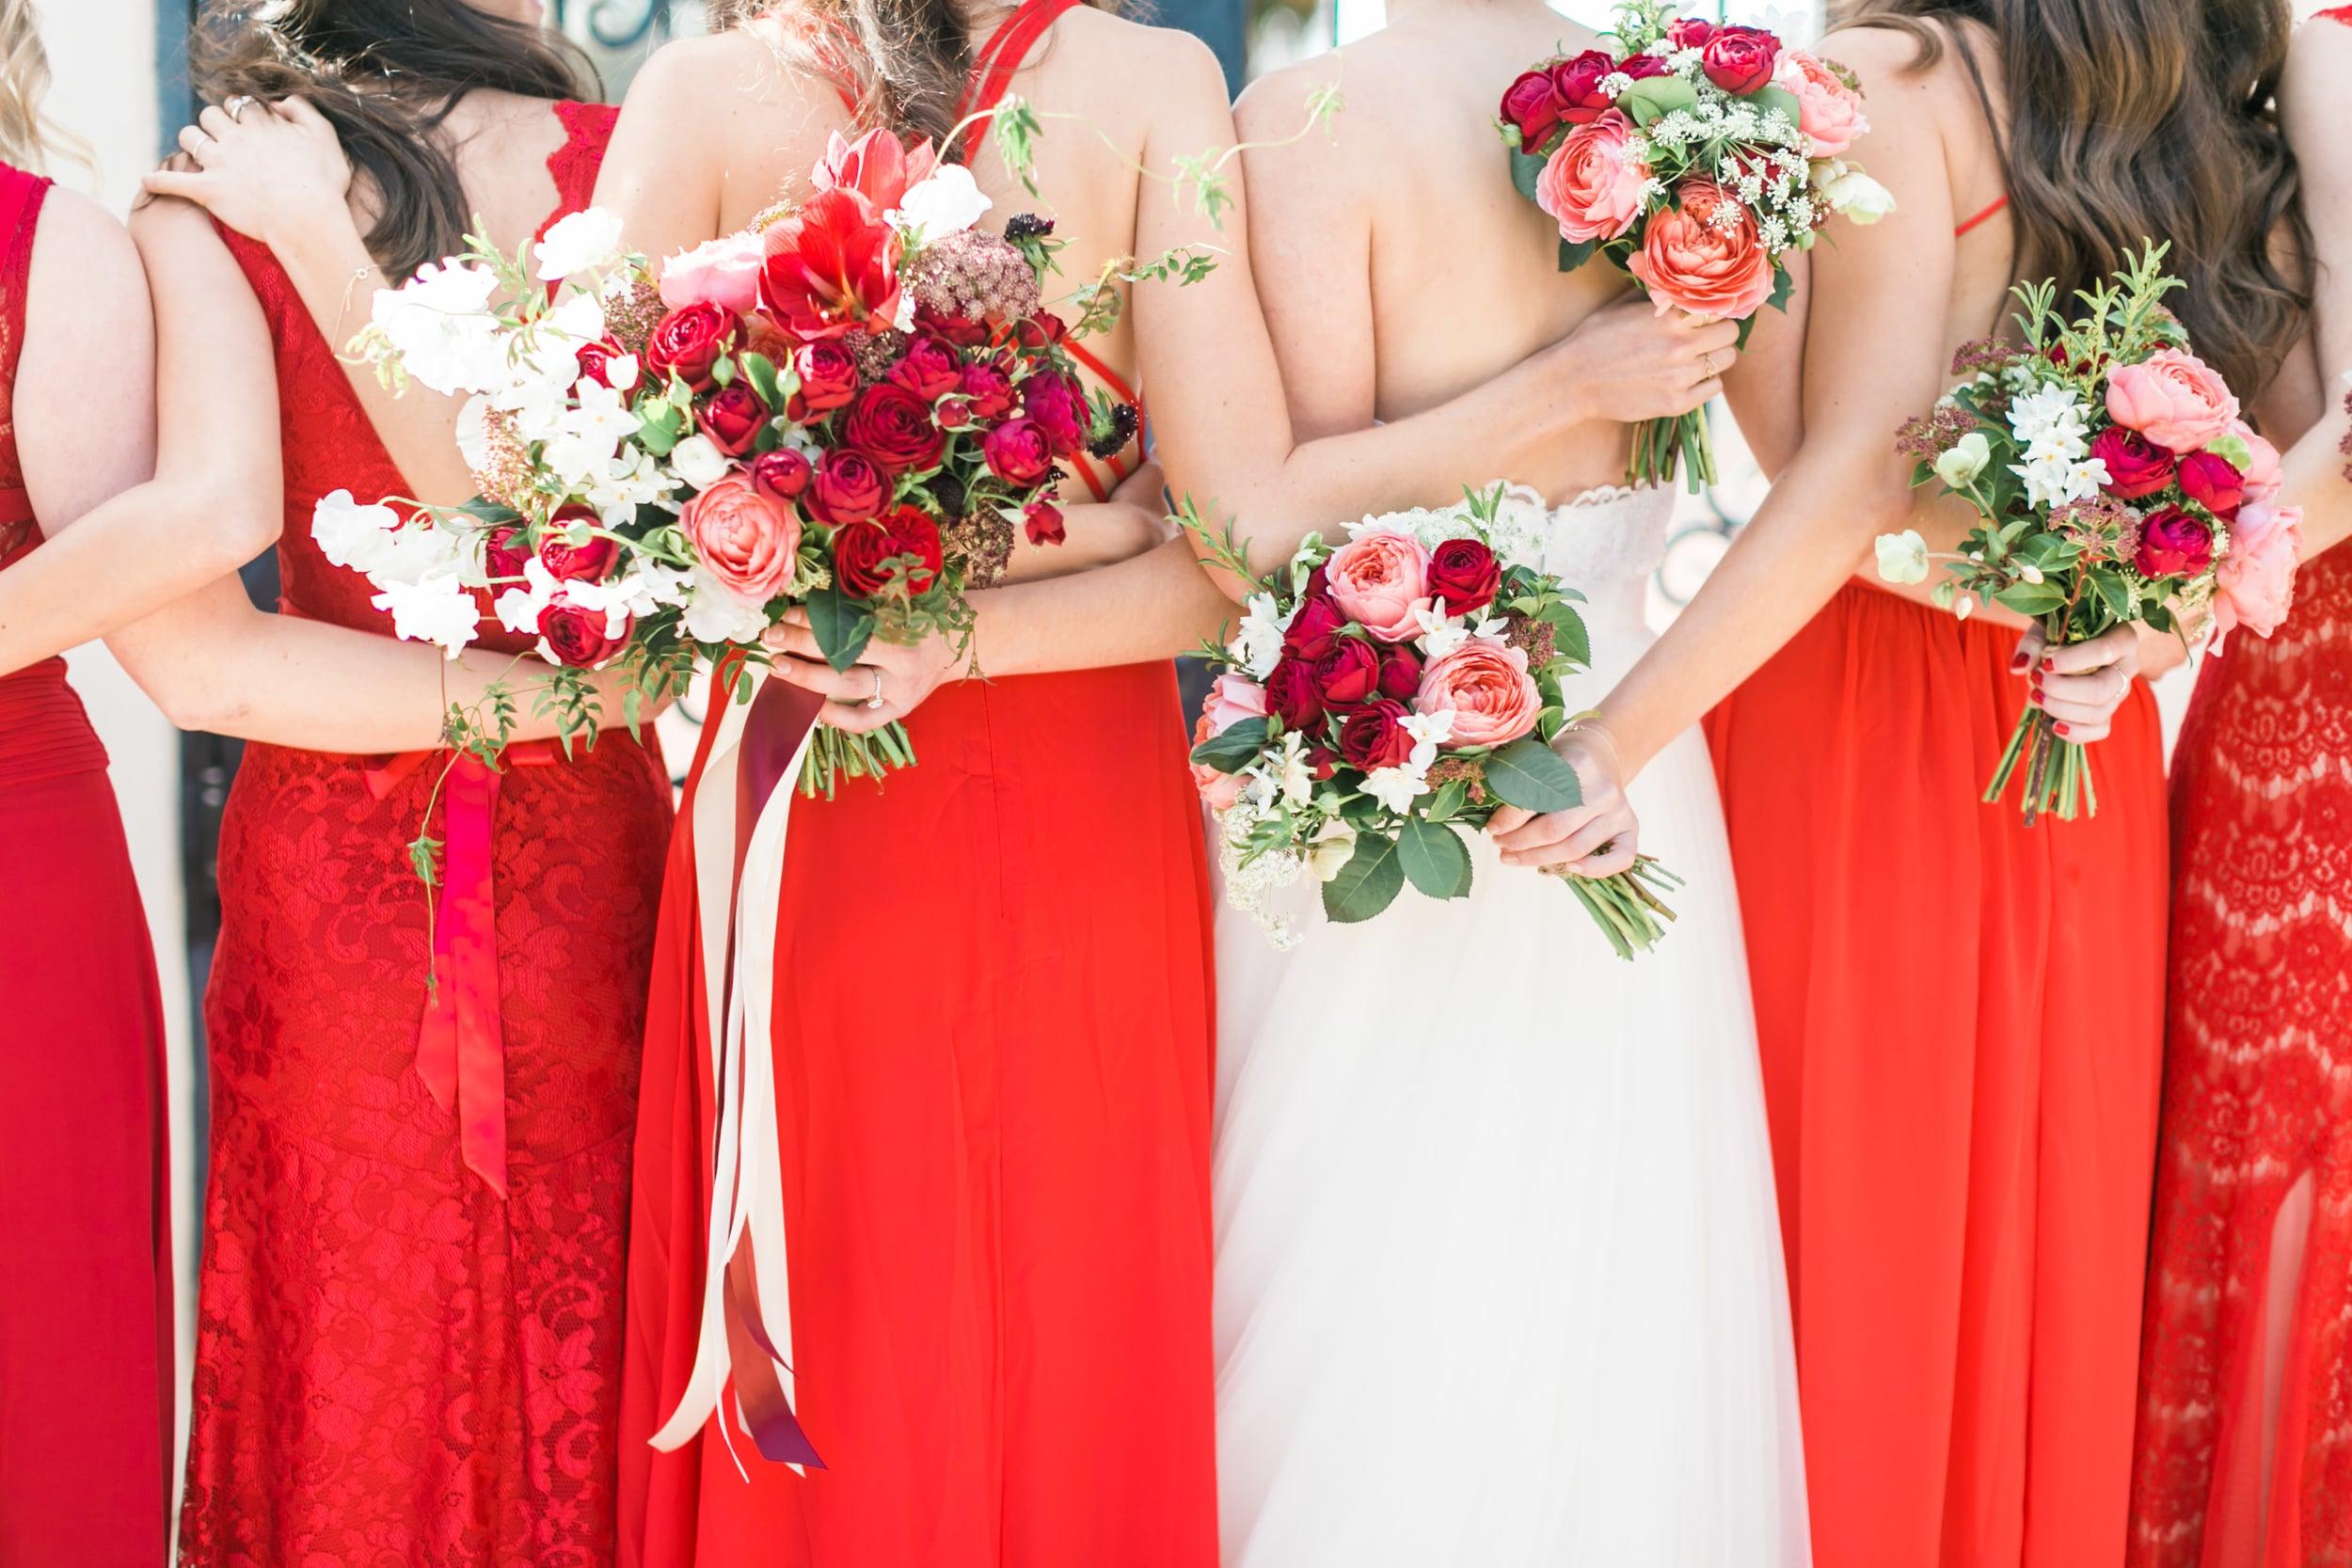 Natalie_Schutt_Photography_Winter_Wedding_San_Luis_Obispo-49.jpg